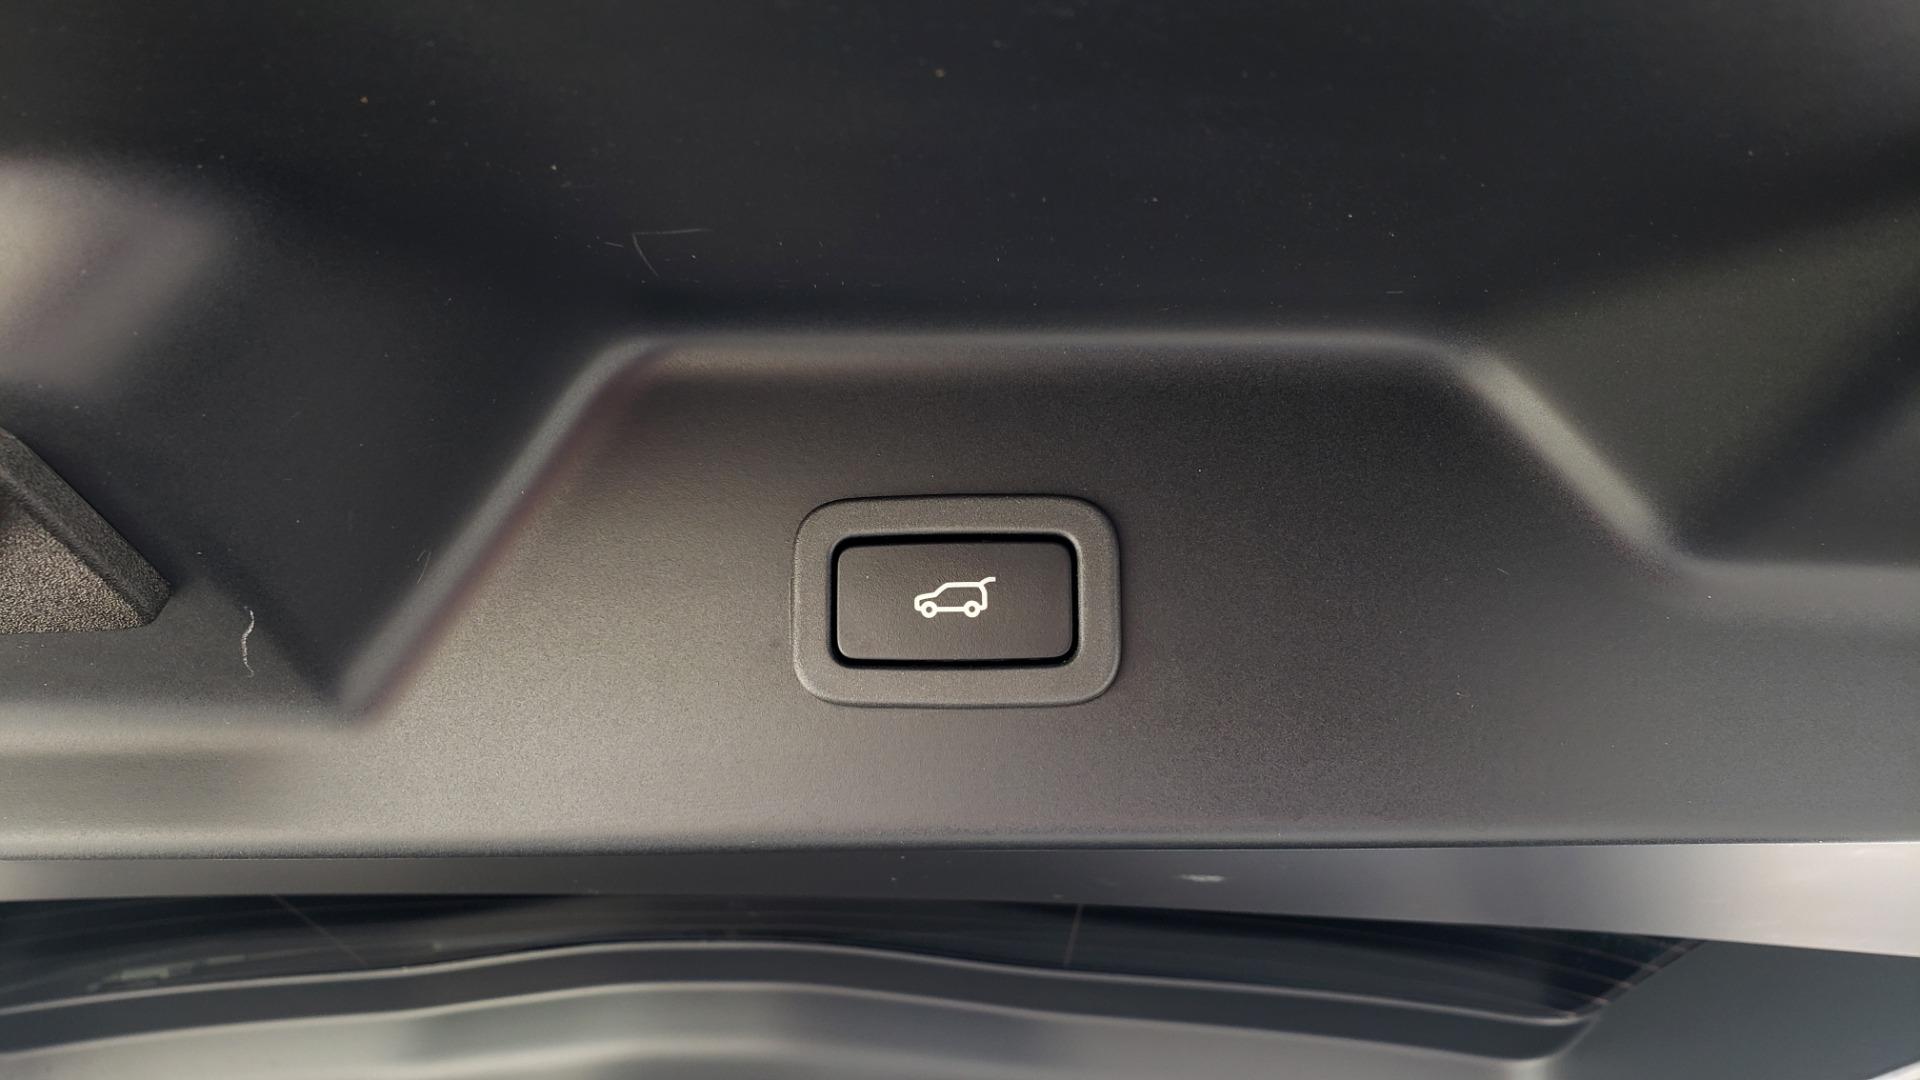 Used 2017 Land Rover RANGE ROVER SC V8 / VISION ASST / DRIVE PKG / MERIDIAN SOUND / PANO-ROOF / NAV / BSM for sale $75,995 at Formula Imports in Charlotte NC 28227 24